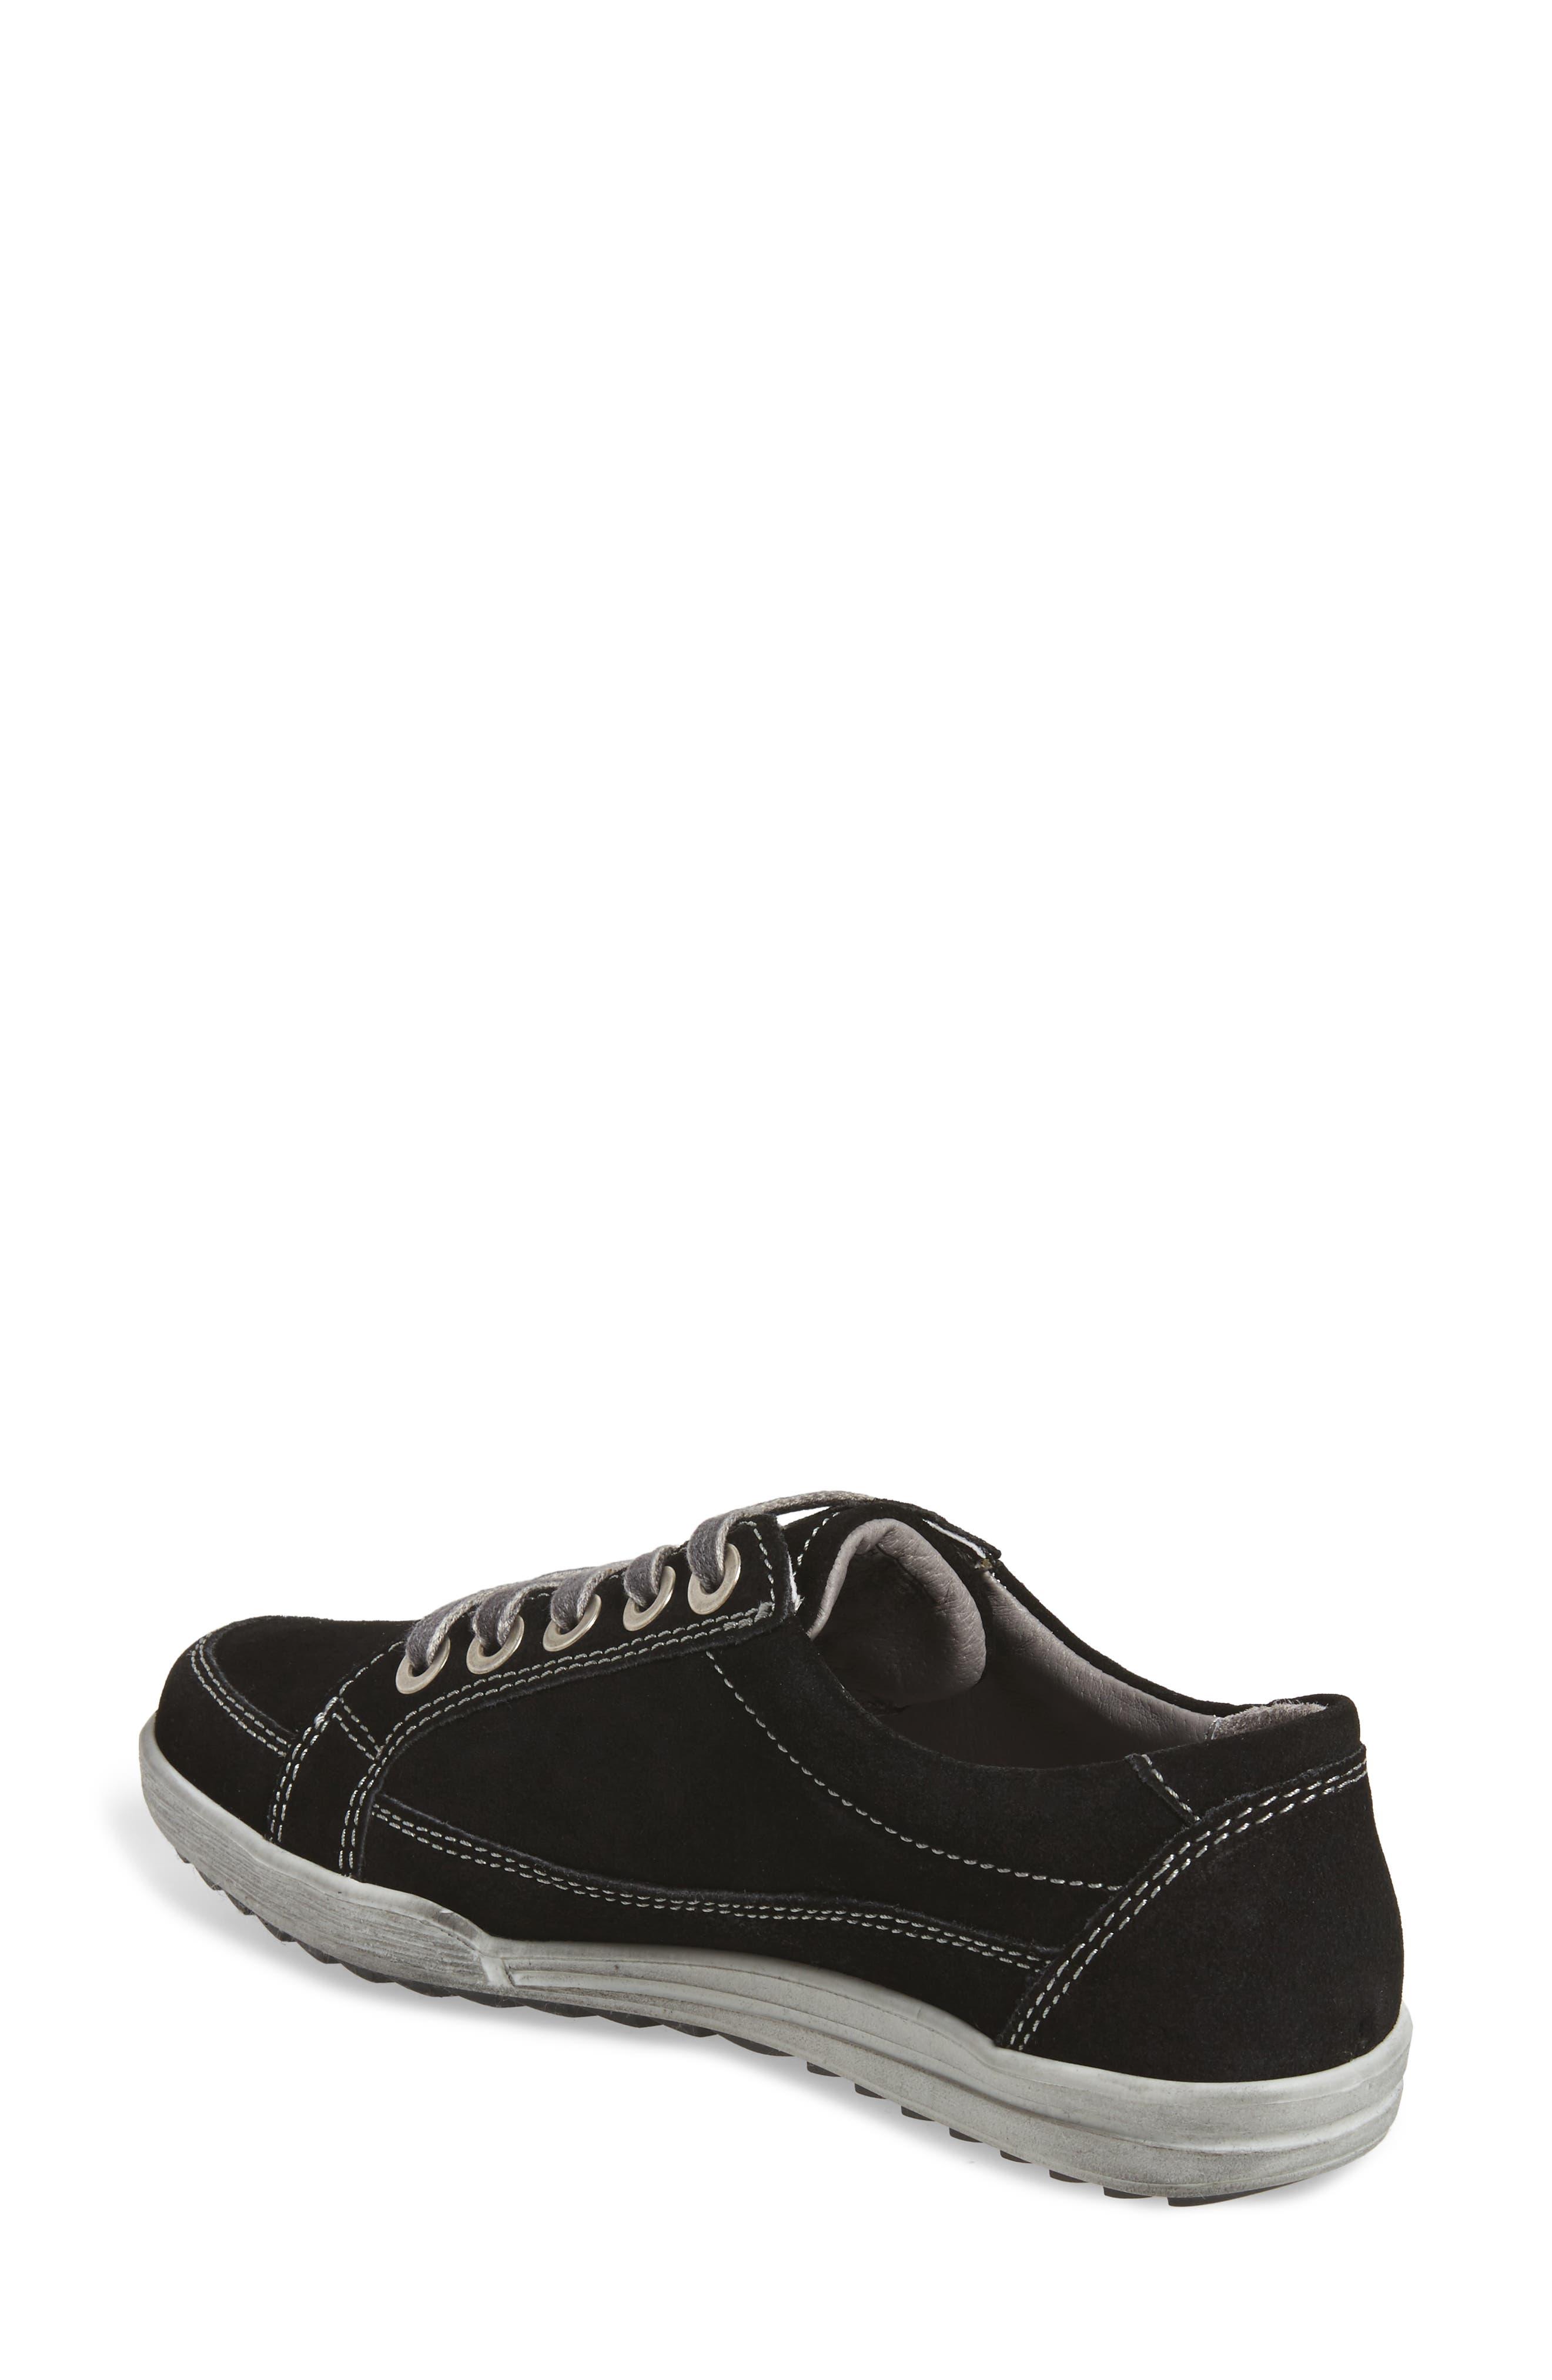 Dany 57 Sneaker,                             Alternate thumbnail 2, color,                             Black Leather